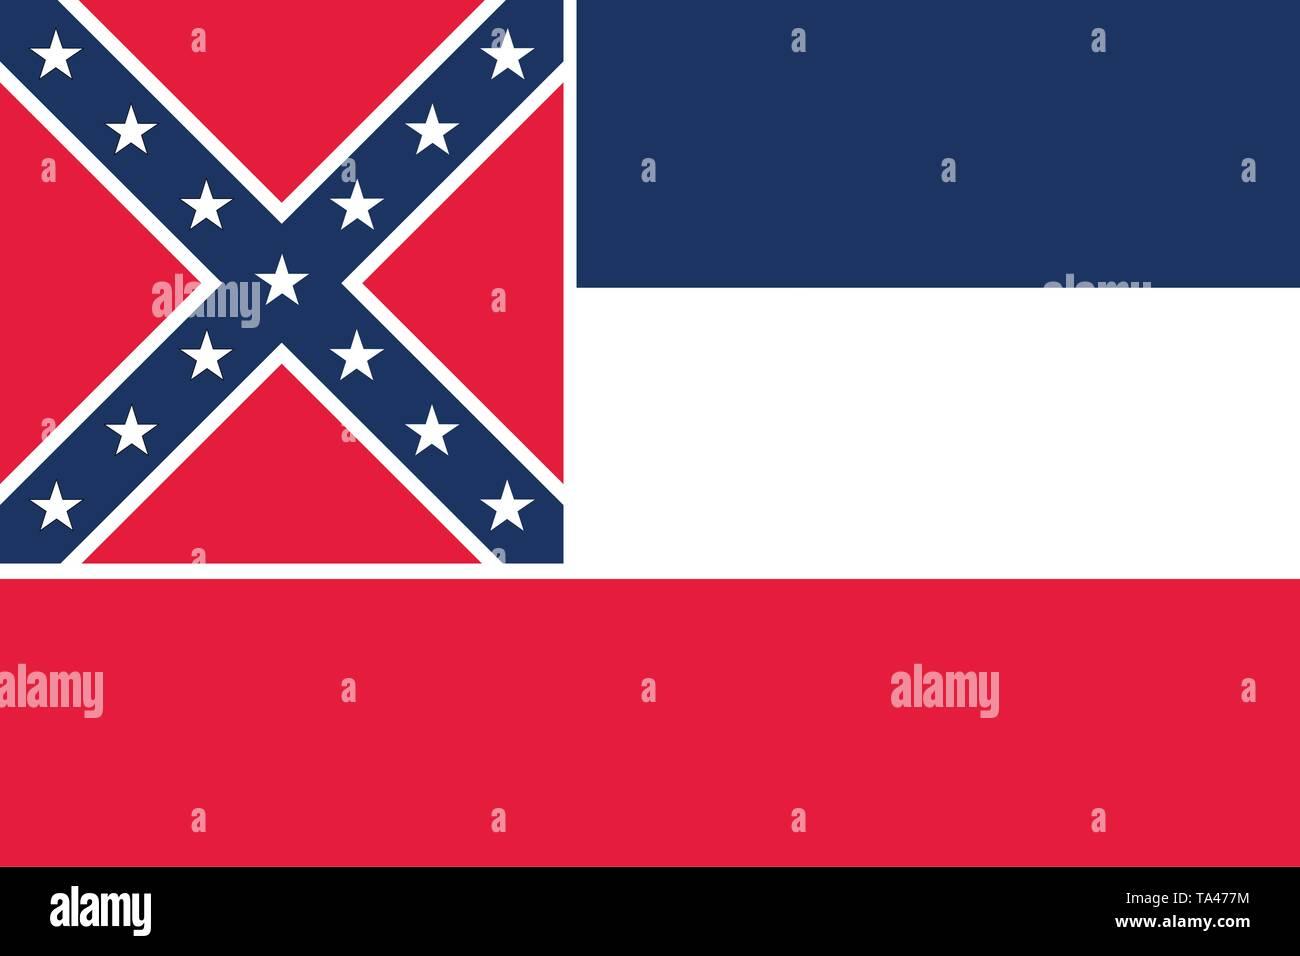 Vector flag illustration of Mississipi, United States of America - Stock Image